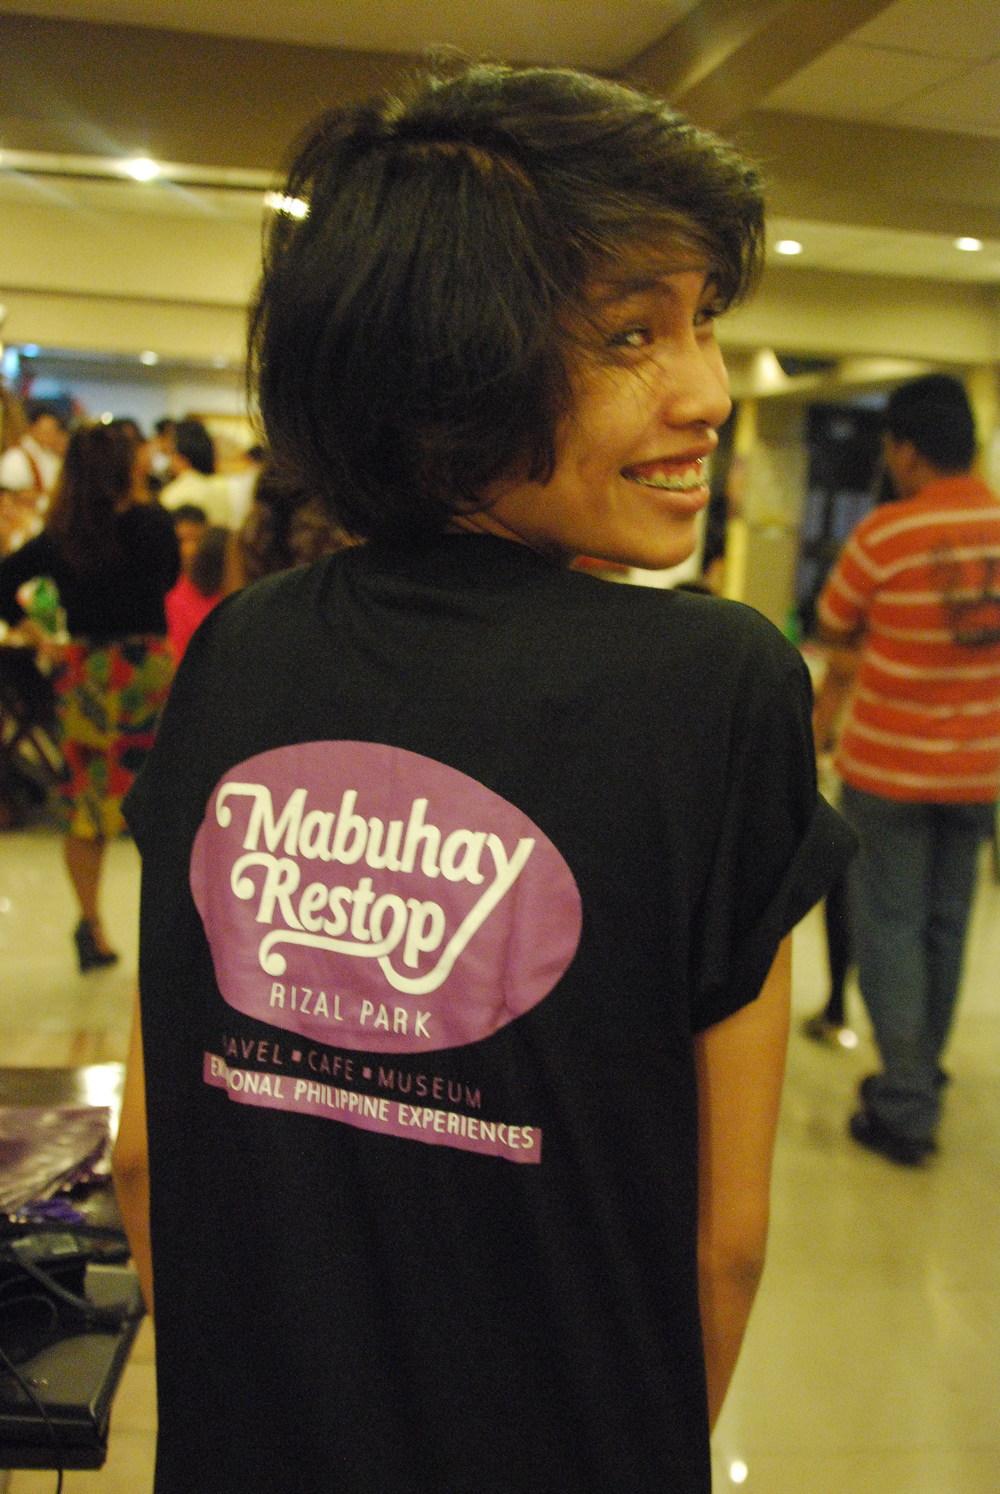 Mabuhay Restop Intern Anne Pagkalinawan